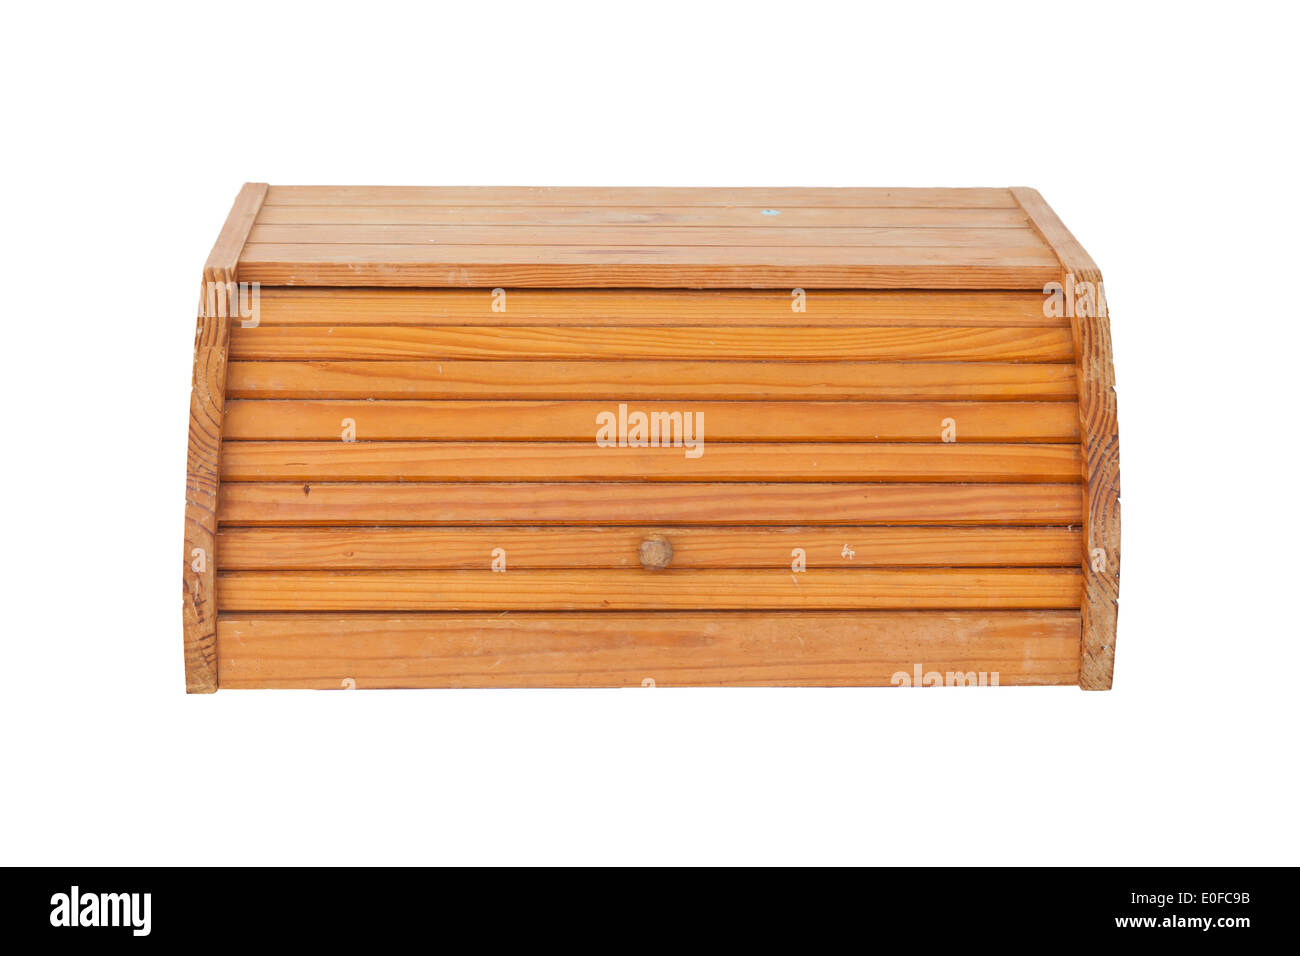 brotkasten aus holz cheap edelstahl brotkasten brotbox brotkiste holz bambus box oval xxcm eco. Black Bedroom Furniture Sets. Home Design Ideas